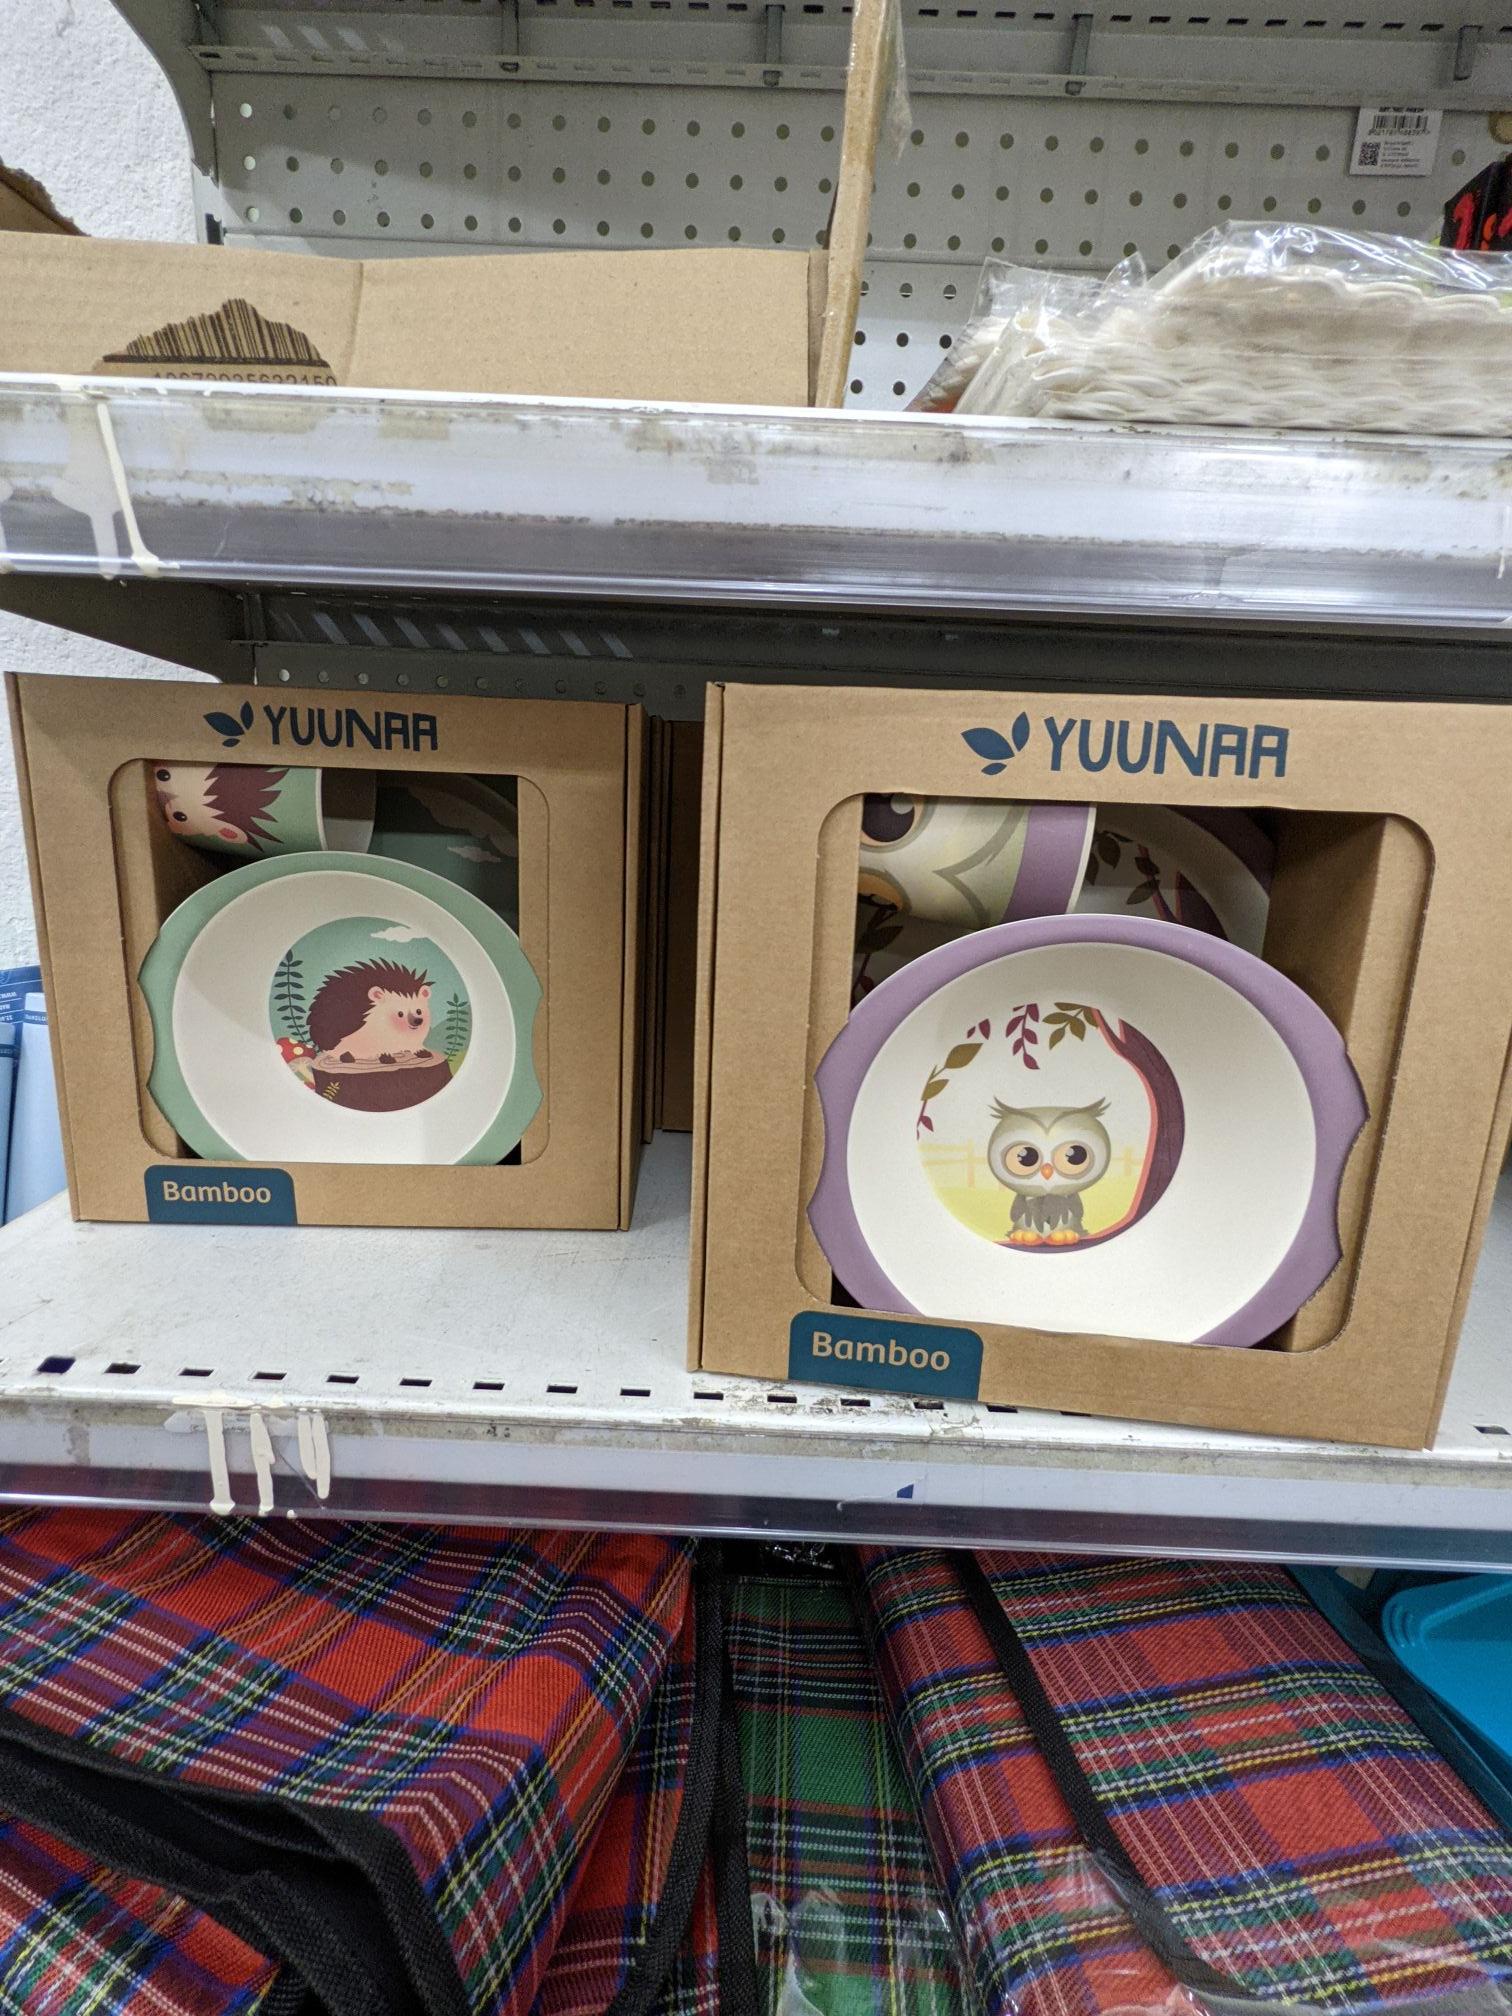 Set de repas en bambou Yuunaa pour bébé (Diverses variétés) - Saumur (49)